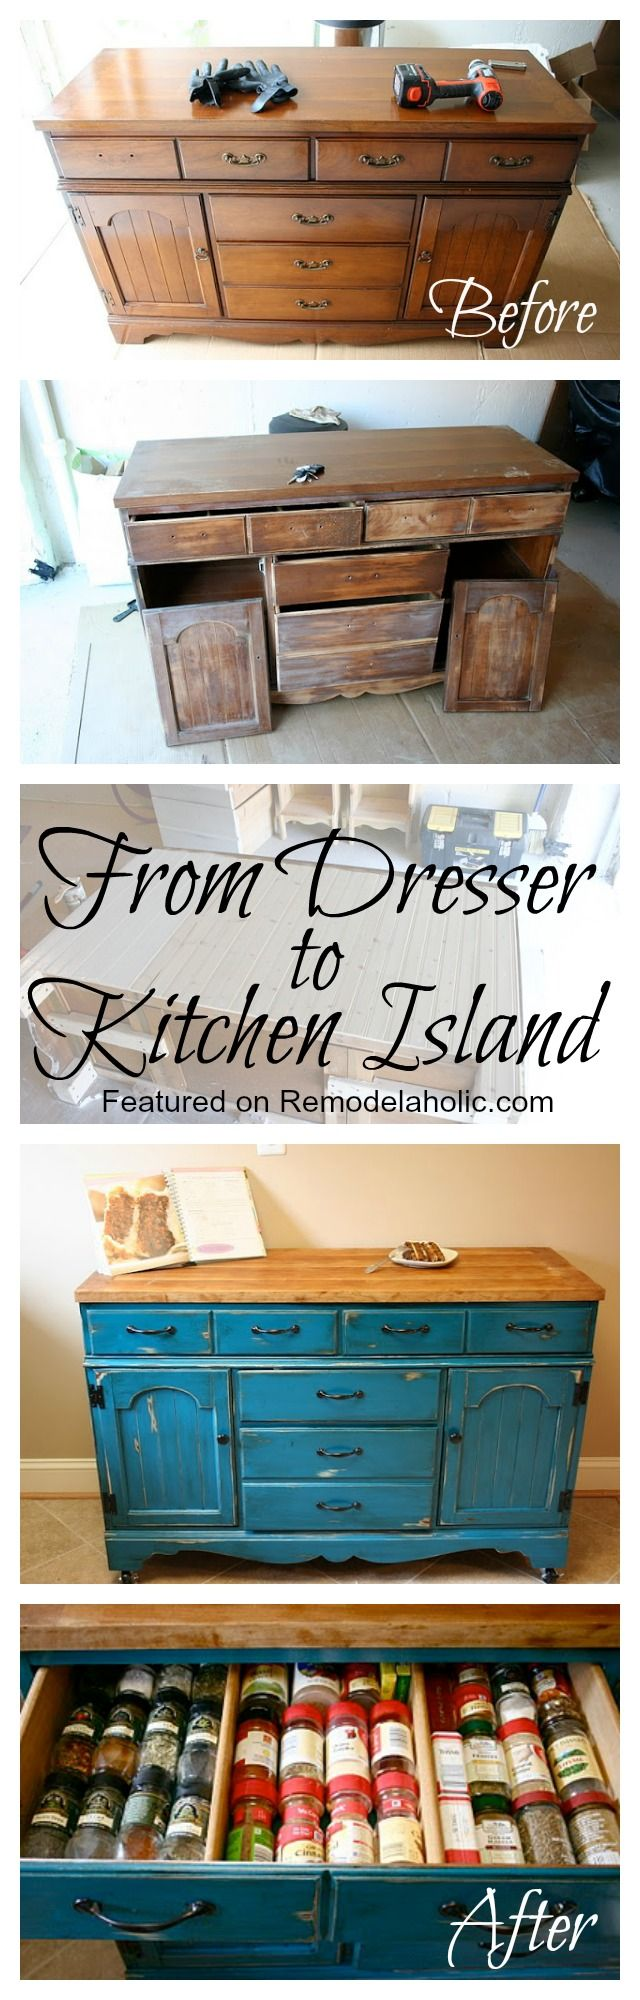 From Dresser To Kitchen Island Tutorial   Kitchen Island Upcycle